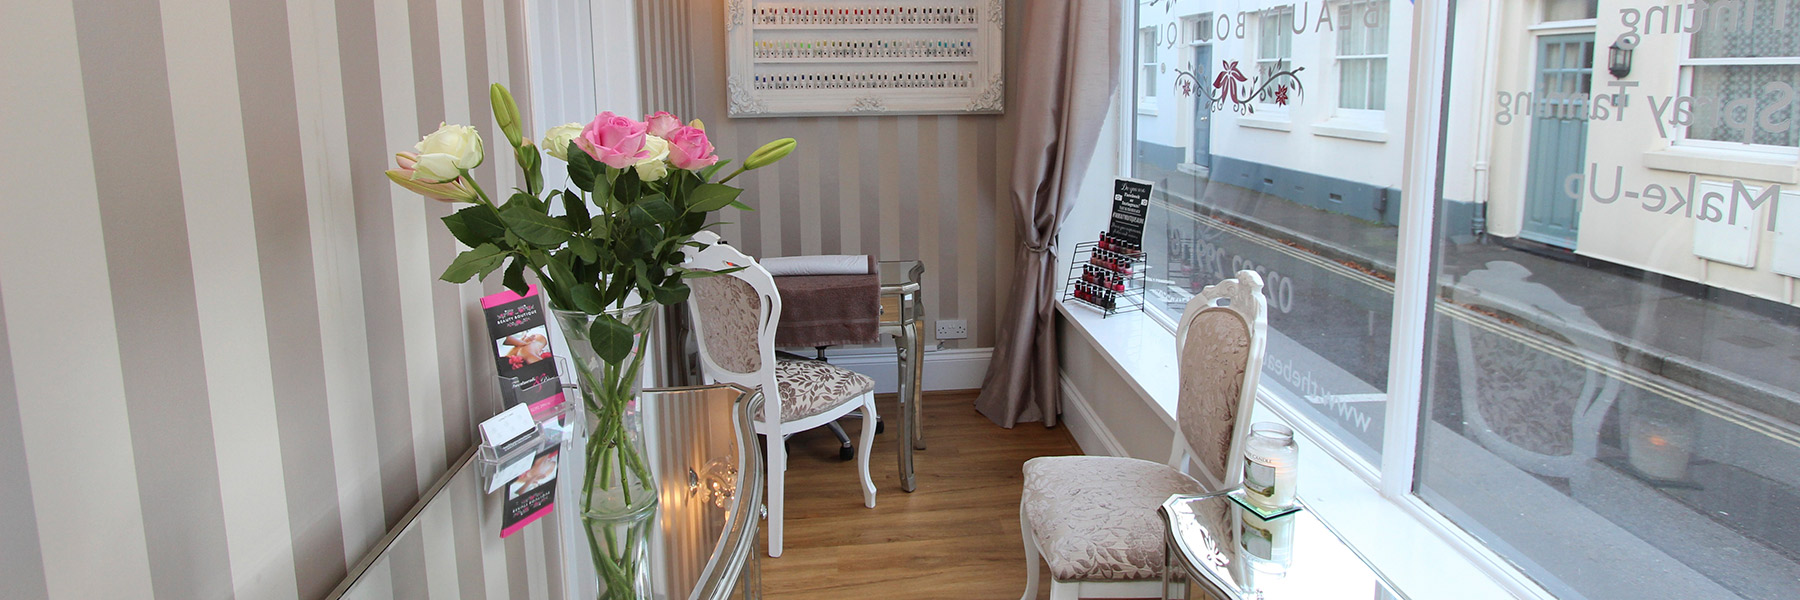 The Beauty Boutique Alverstoke